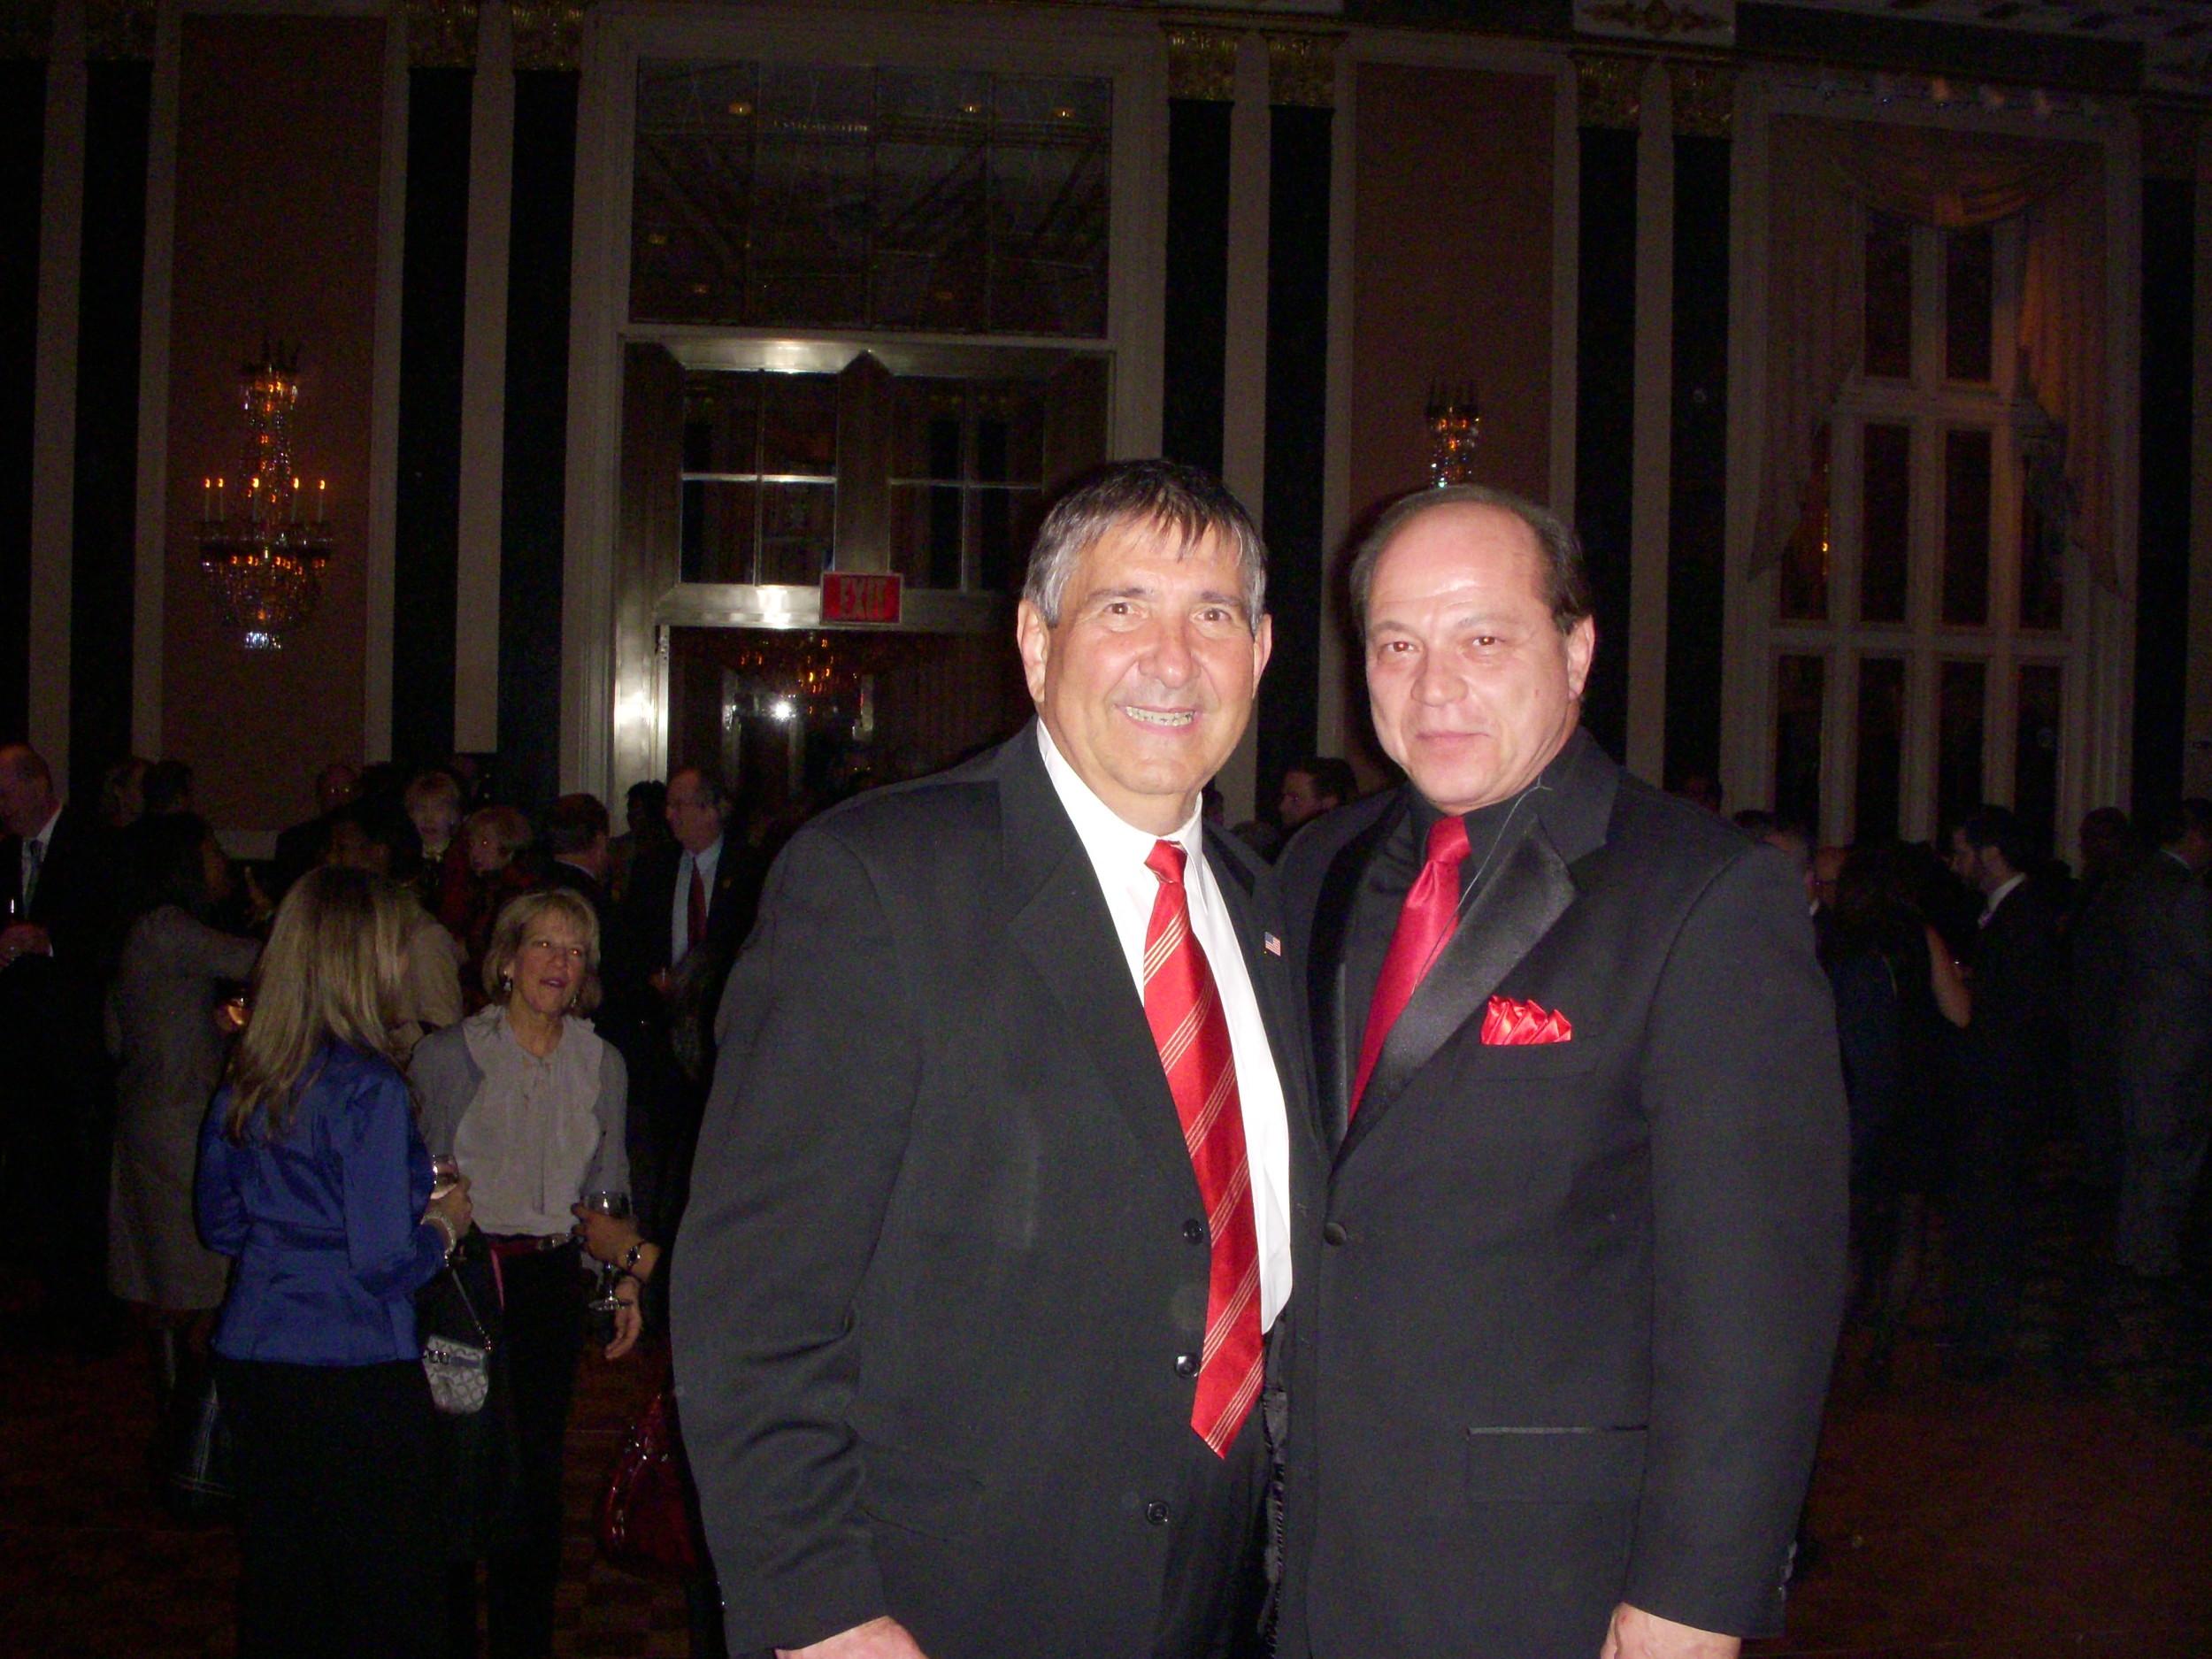 Waldorf Astoria with Frank Rizzo